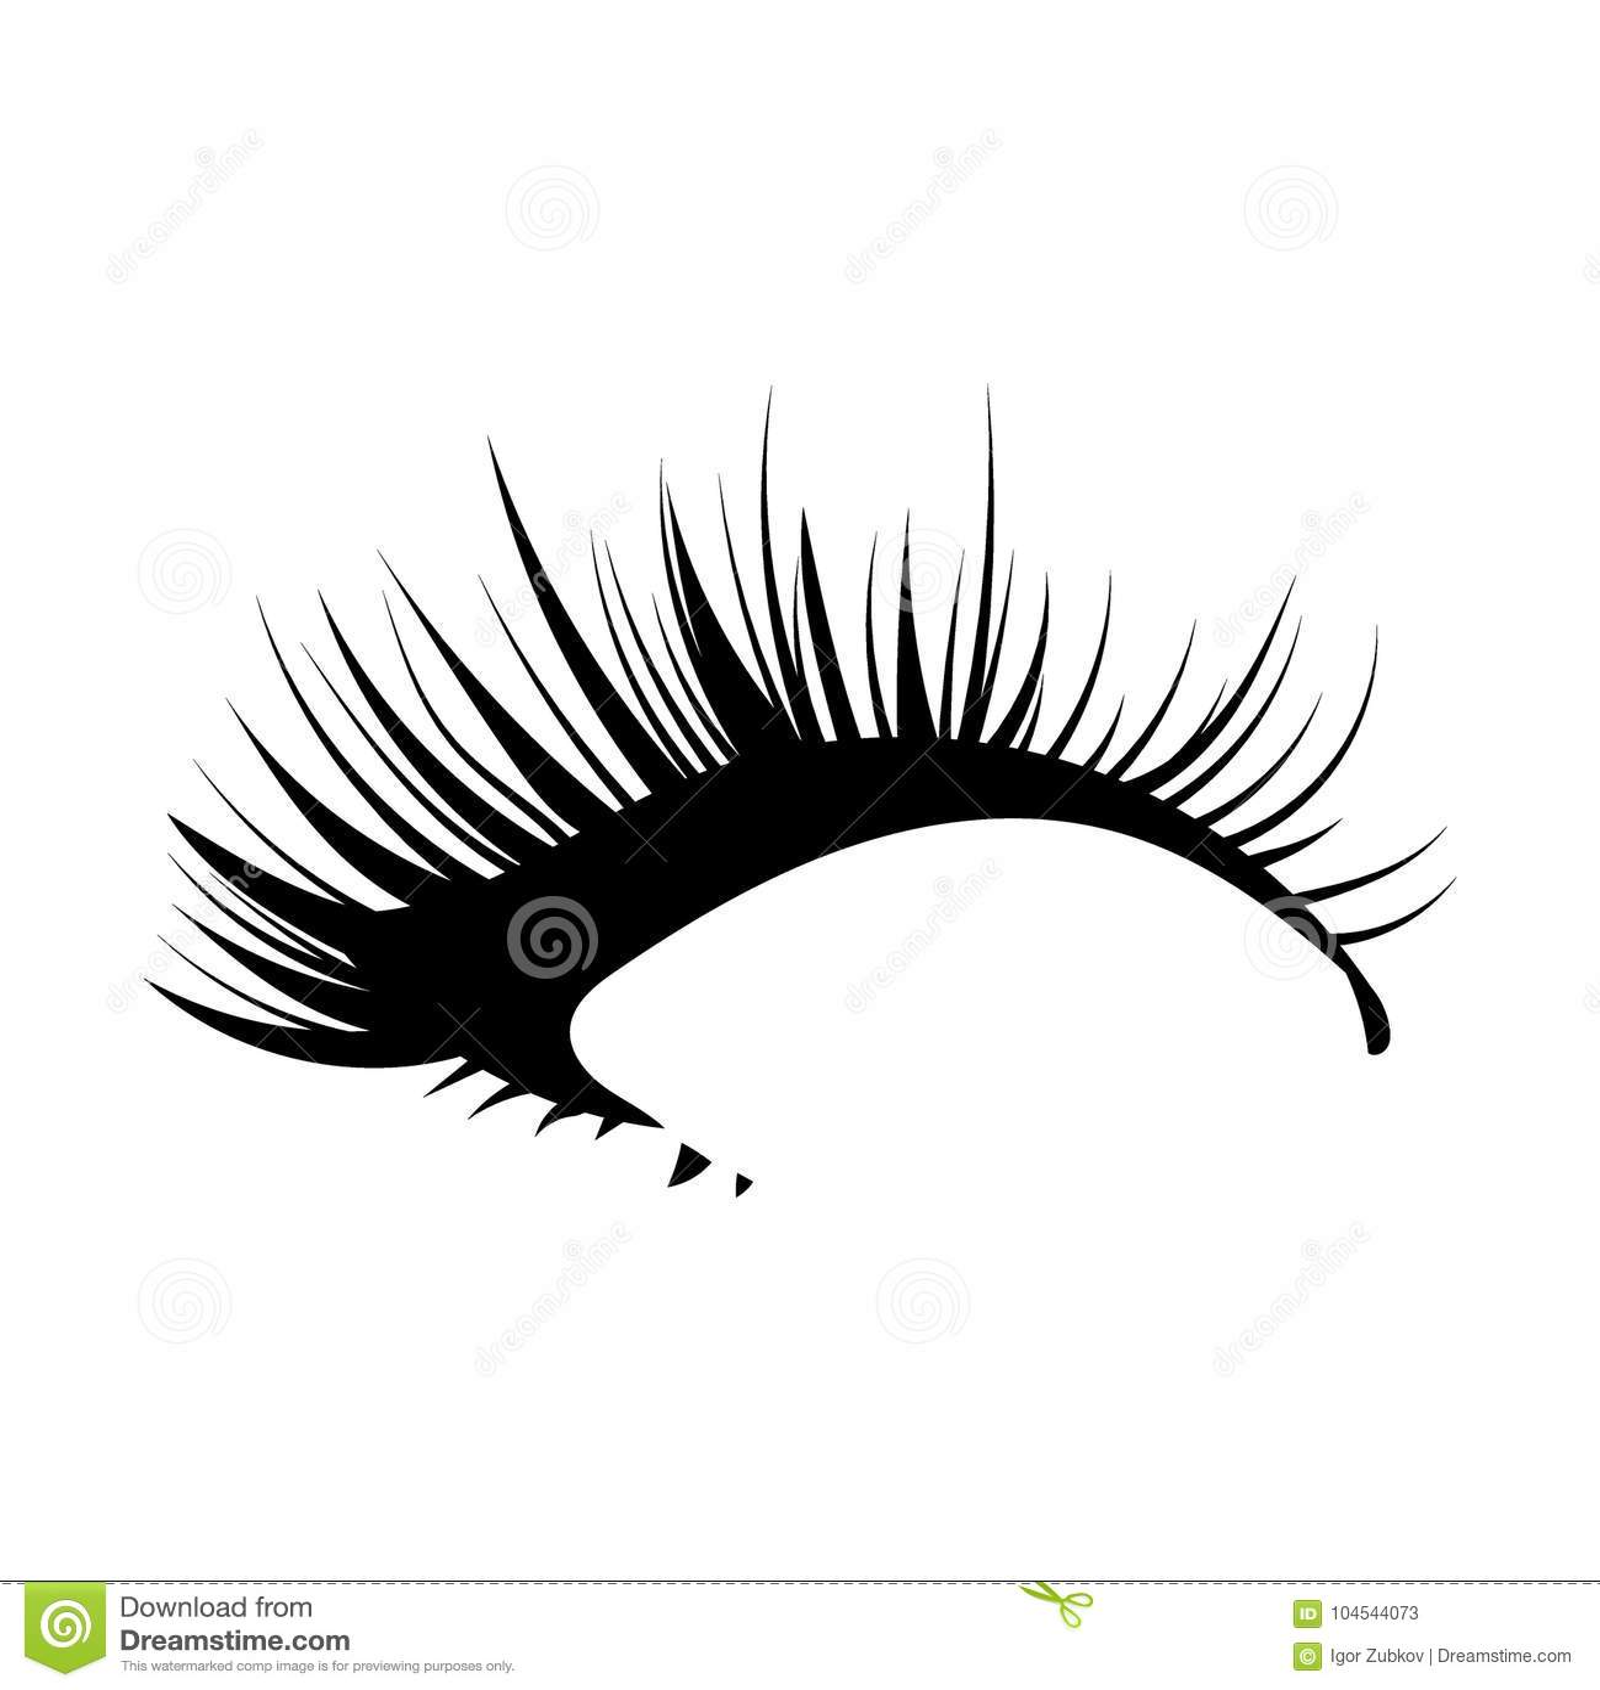 Logo of eyelashes. Stylized hair. Abstract lines of triangular shape. Black and white vector illustration.